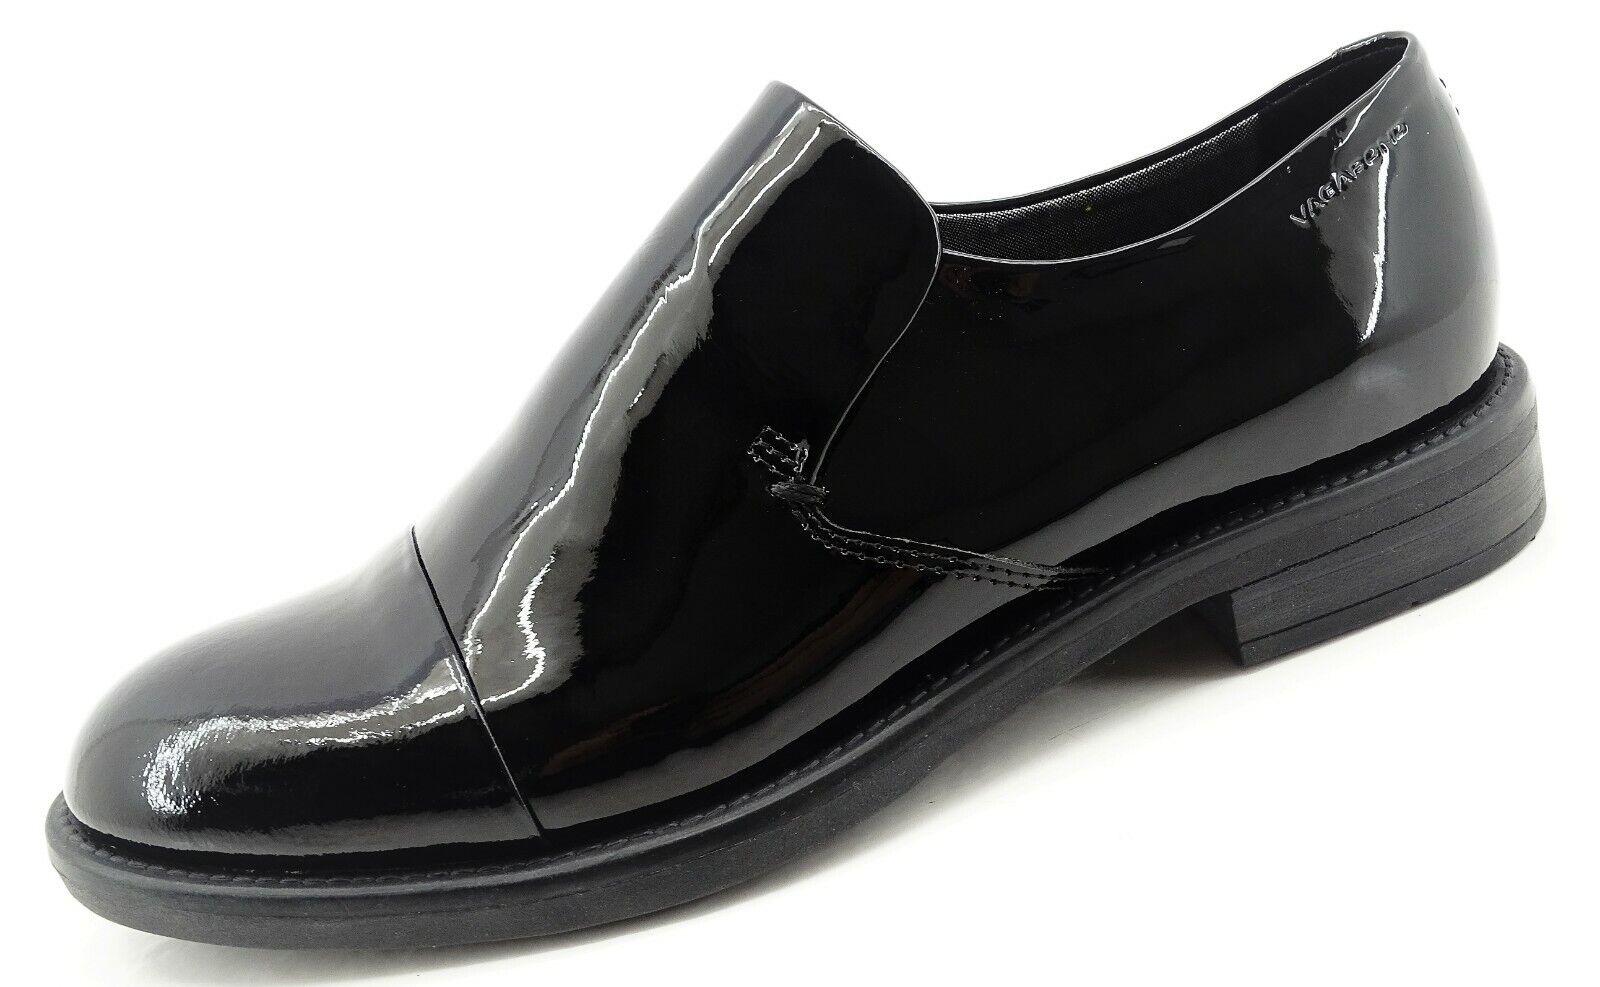 Vagabond AMINA Damen Schuhe schwarz Lack Echtleder Halbschuhe Gr 37